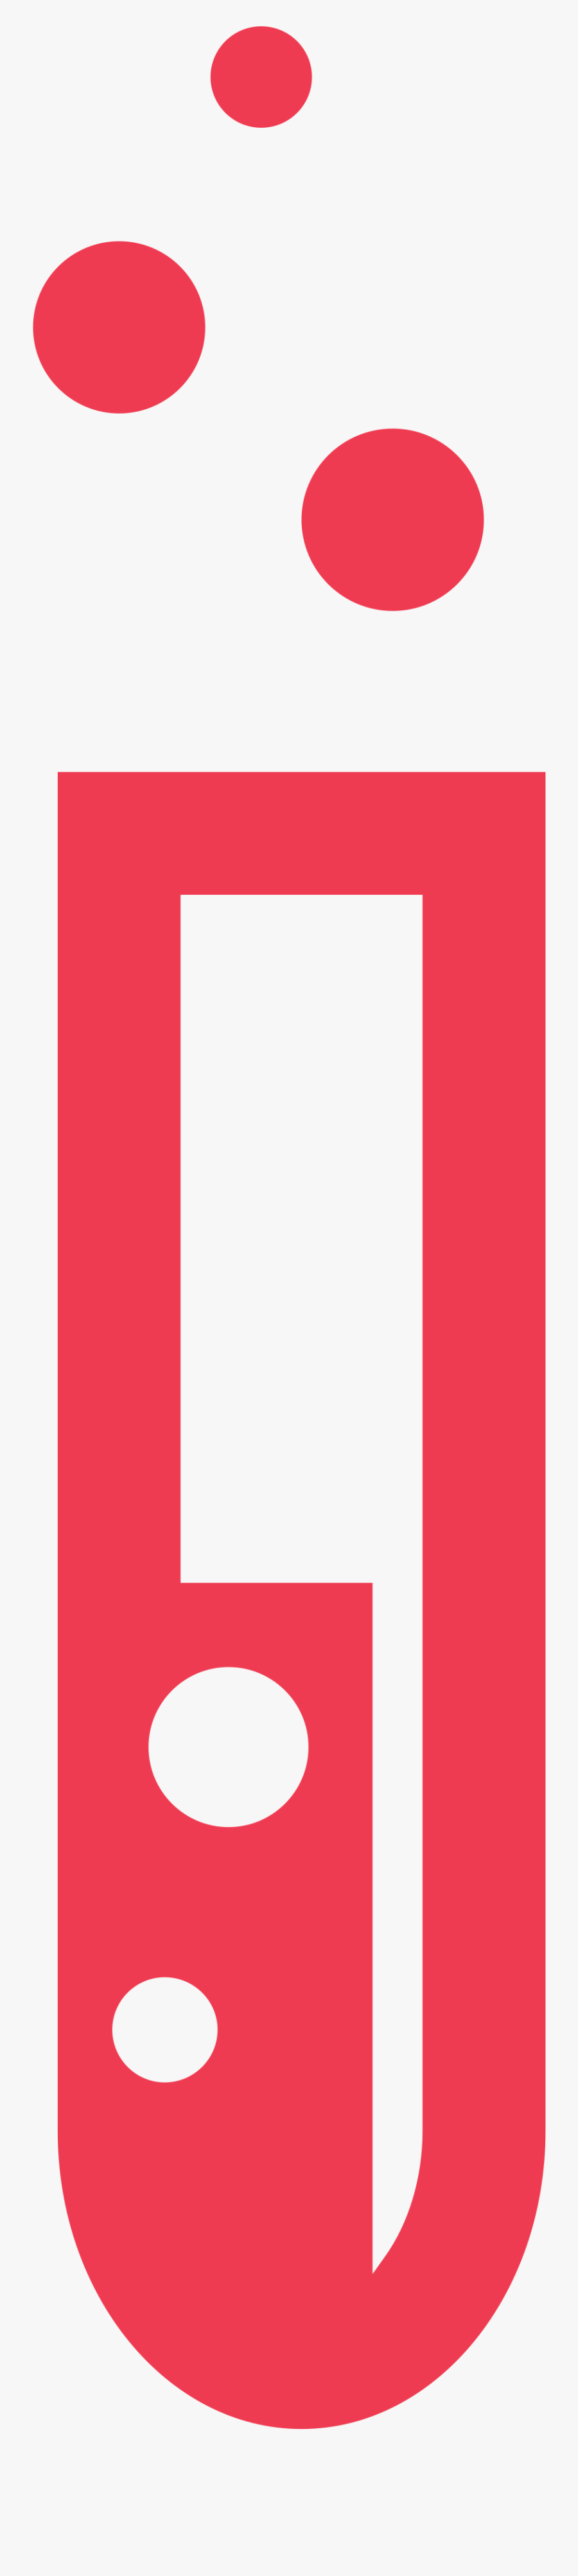 Test Clipart Svg - Test Tube Svg, Transparent Clipart